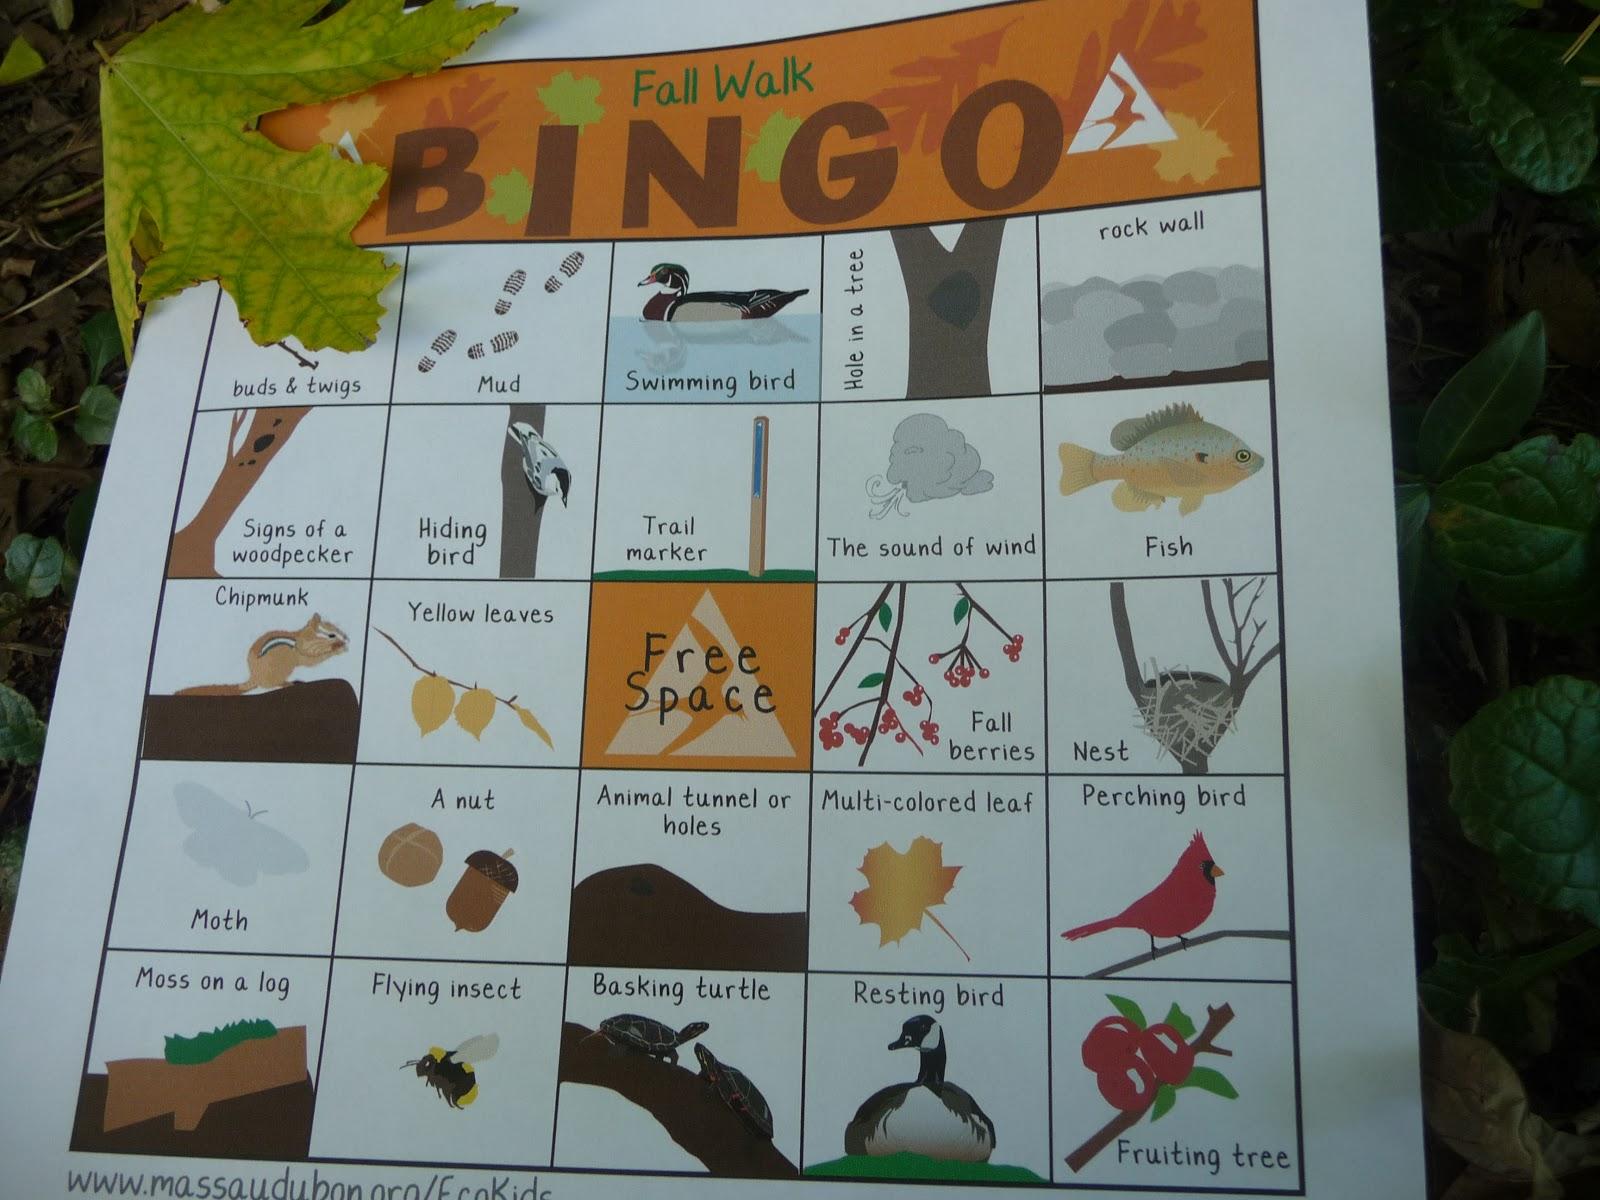 Fall Hike Bingo A Fun Way To Keep Kids On The Trail